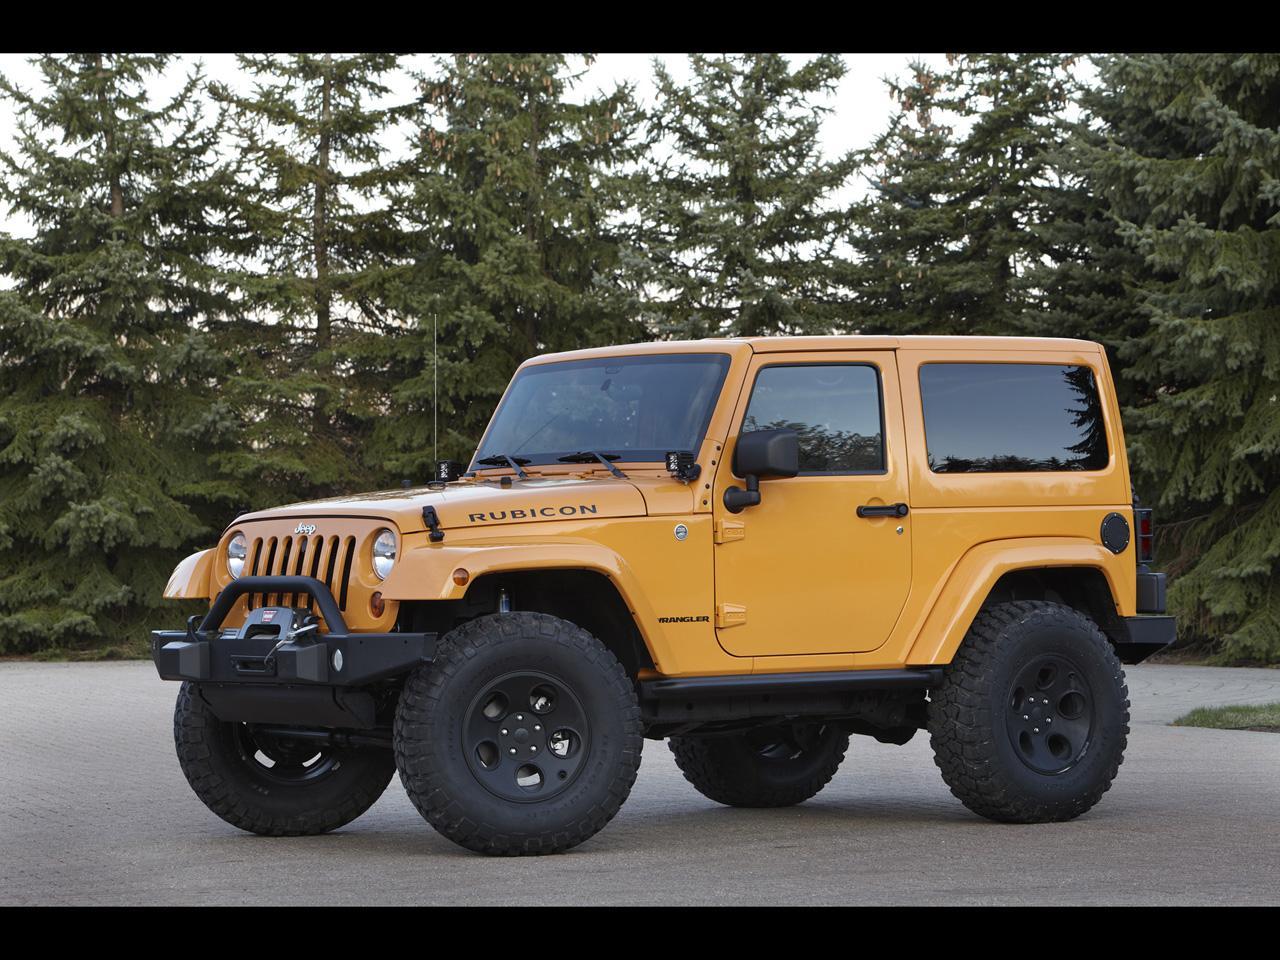 2012 Jeep Moab Easter Safari Concepts - Mopar Accessorized Jeep Wrangler - 1280x960 - Wallpaper